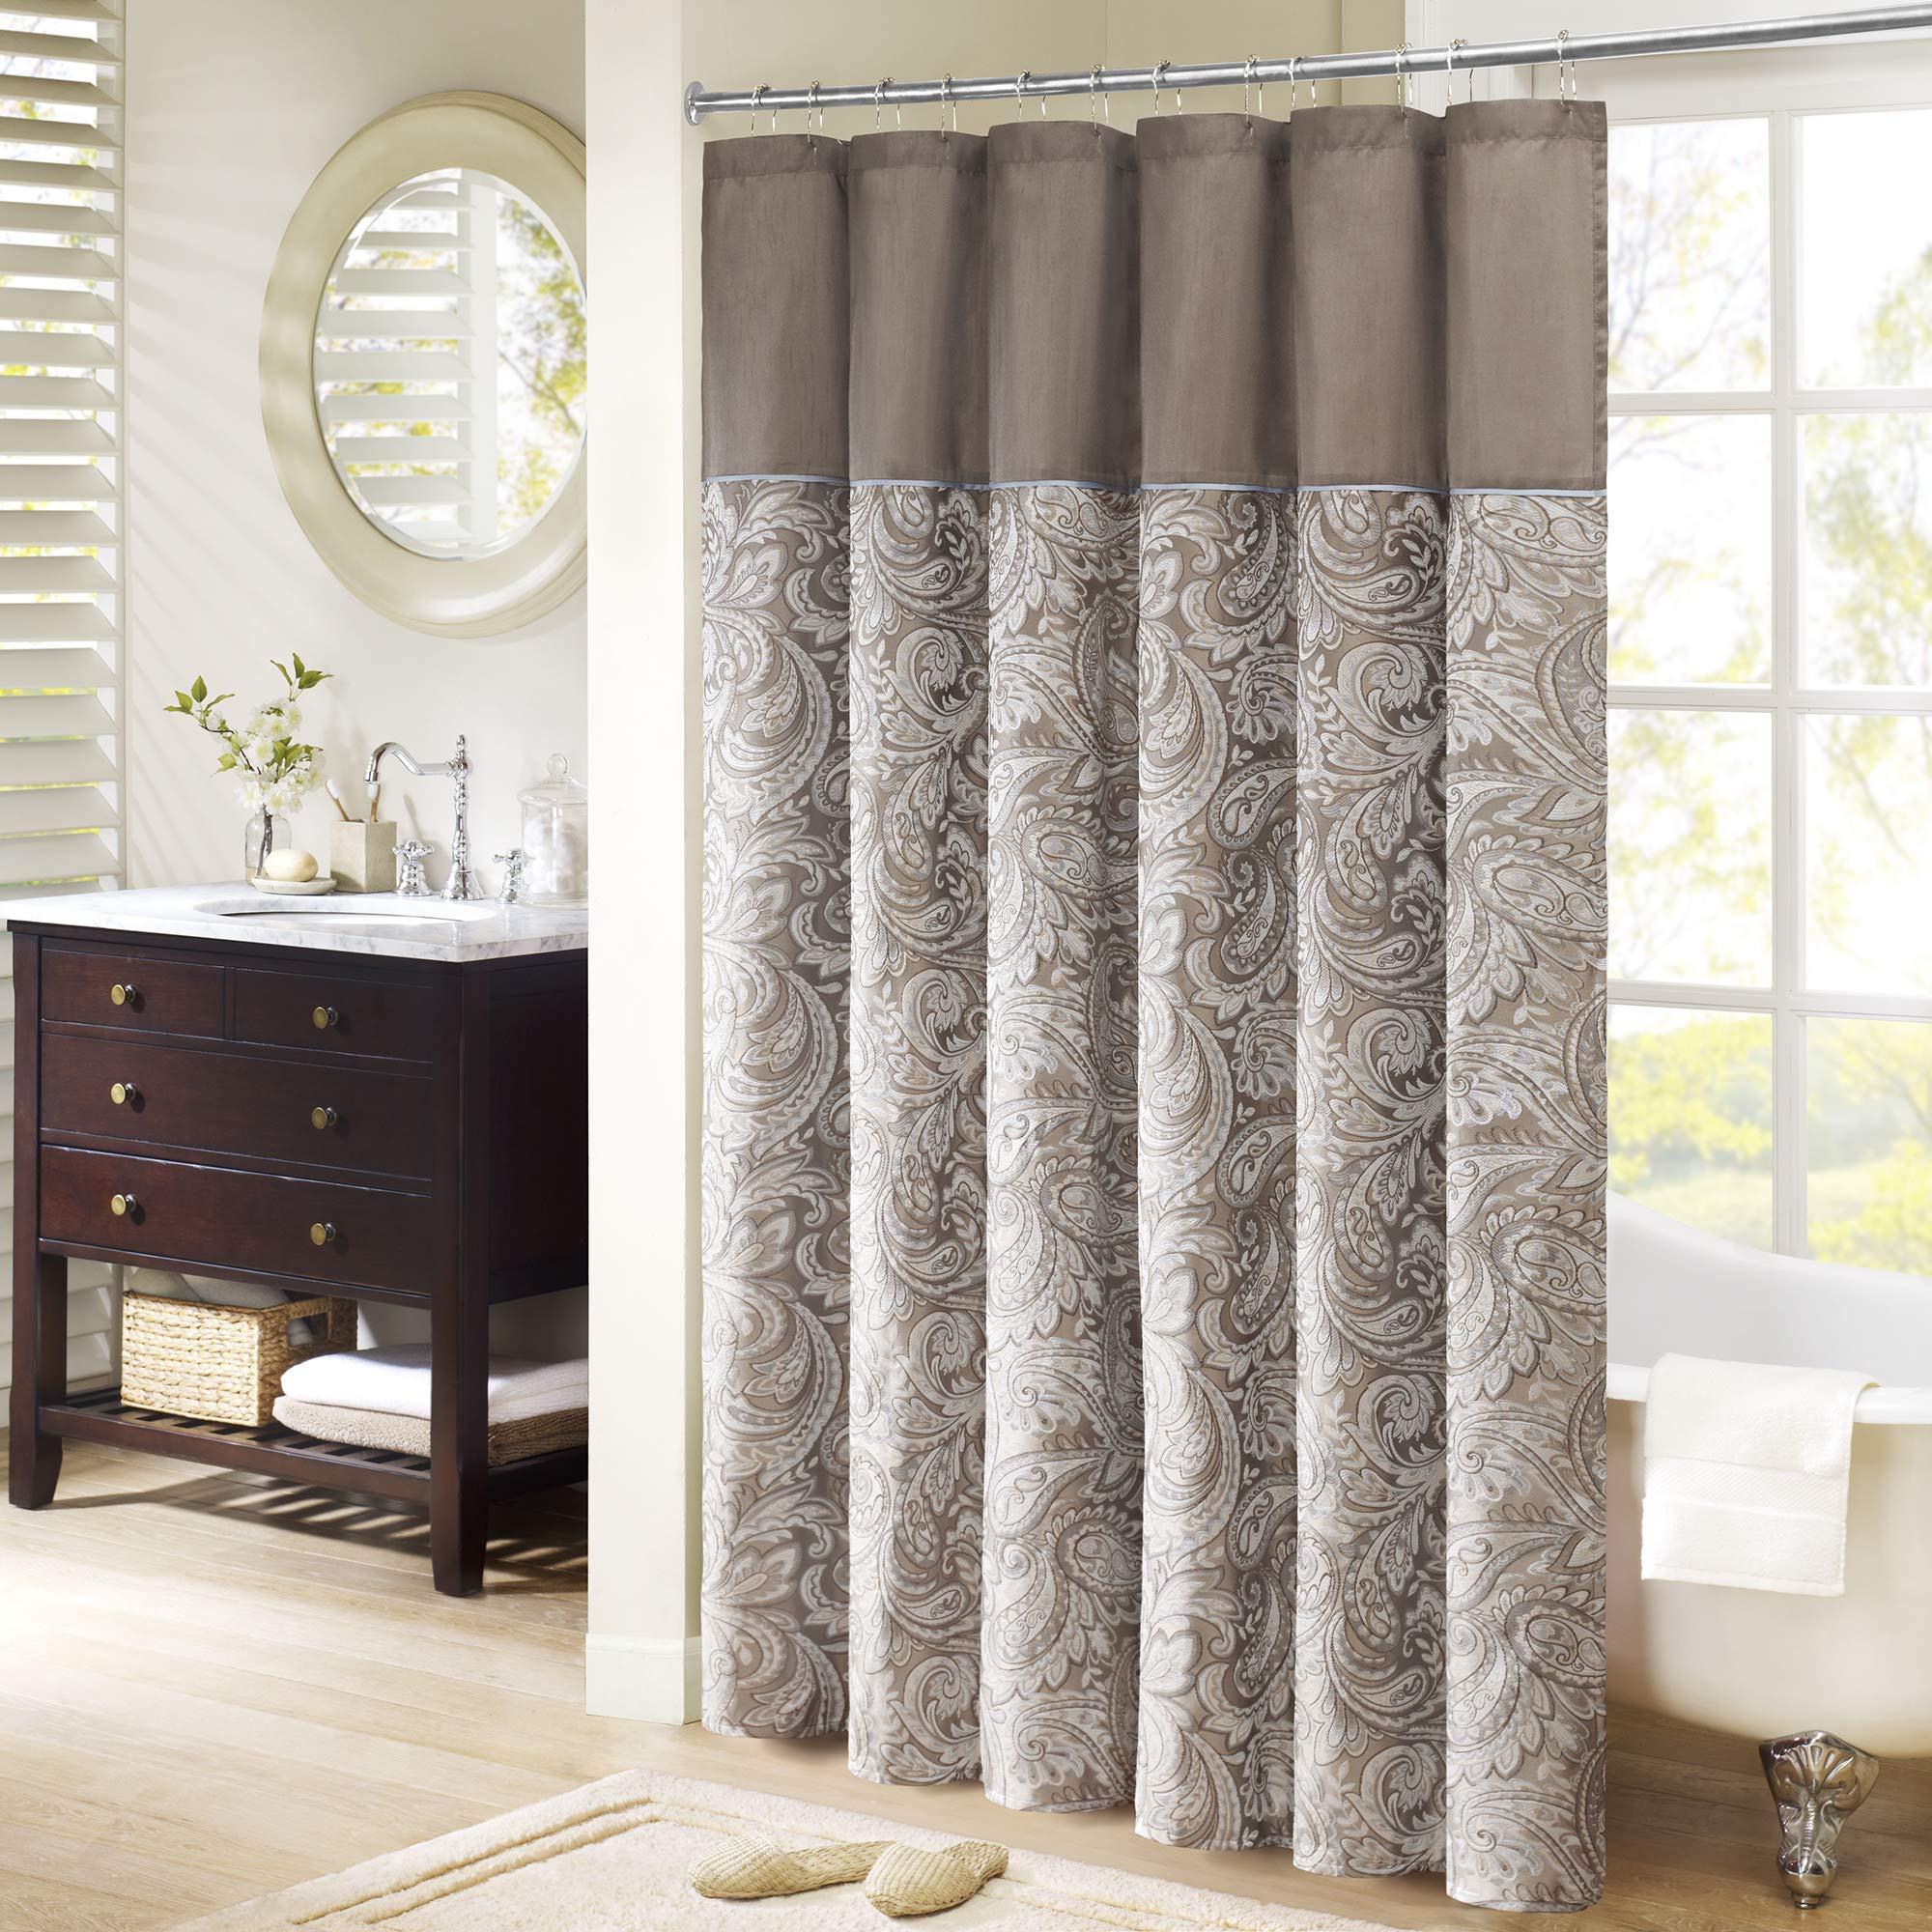 fancy shower curtains for bathroom amazon com rh amazon com